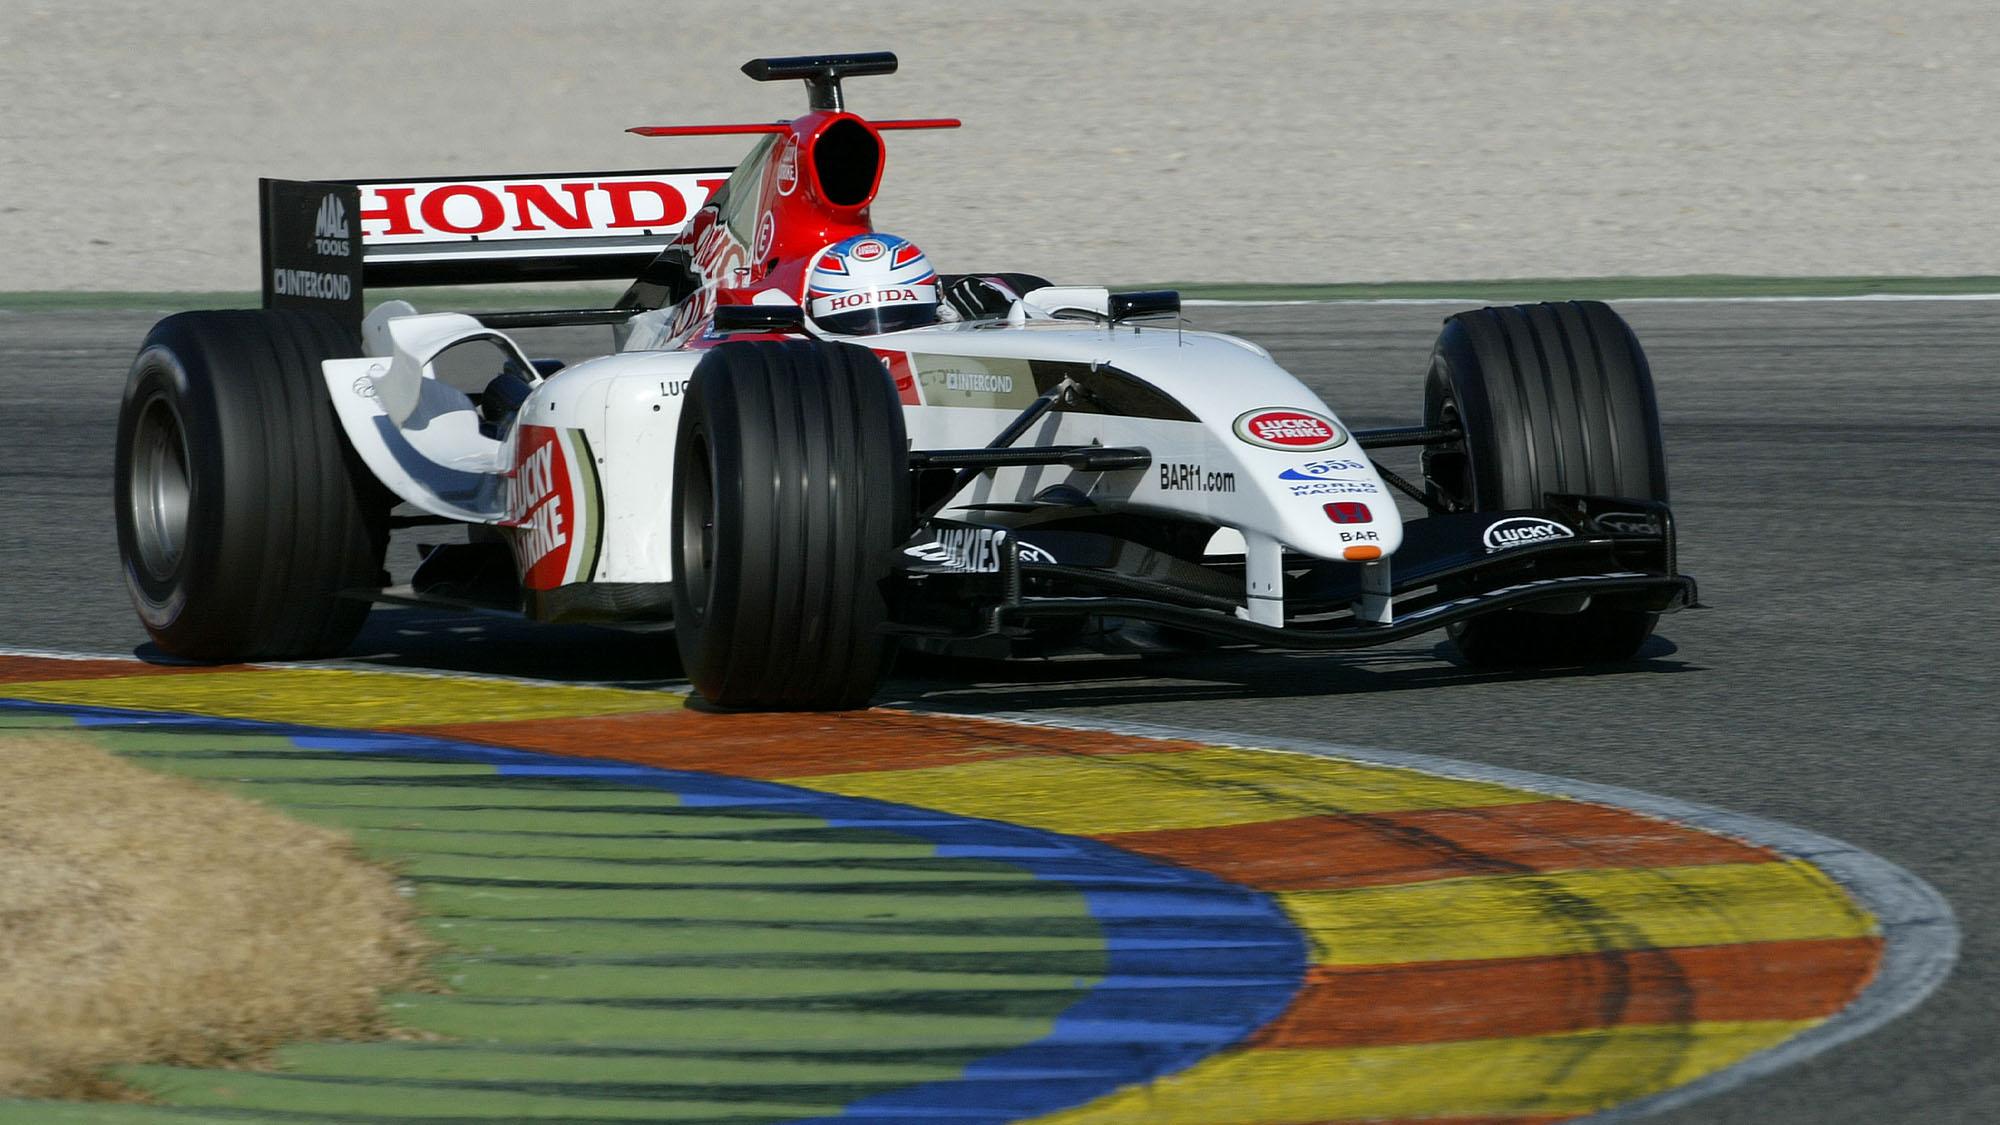 AUTO - F1 2005 - VALENCIA TESTS 02/04/2005 - PHOTO: JEAN MICHEL LE MEUR / DPPI ADAM CARROLL BAR ACTION